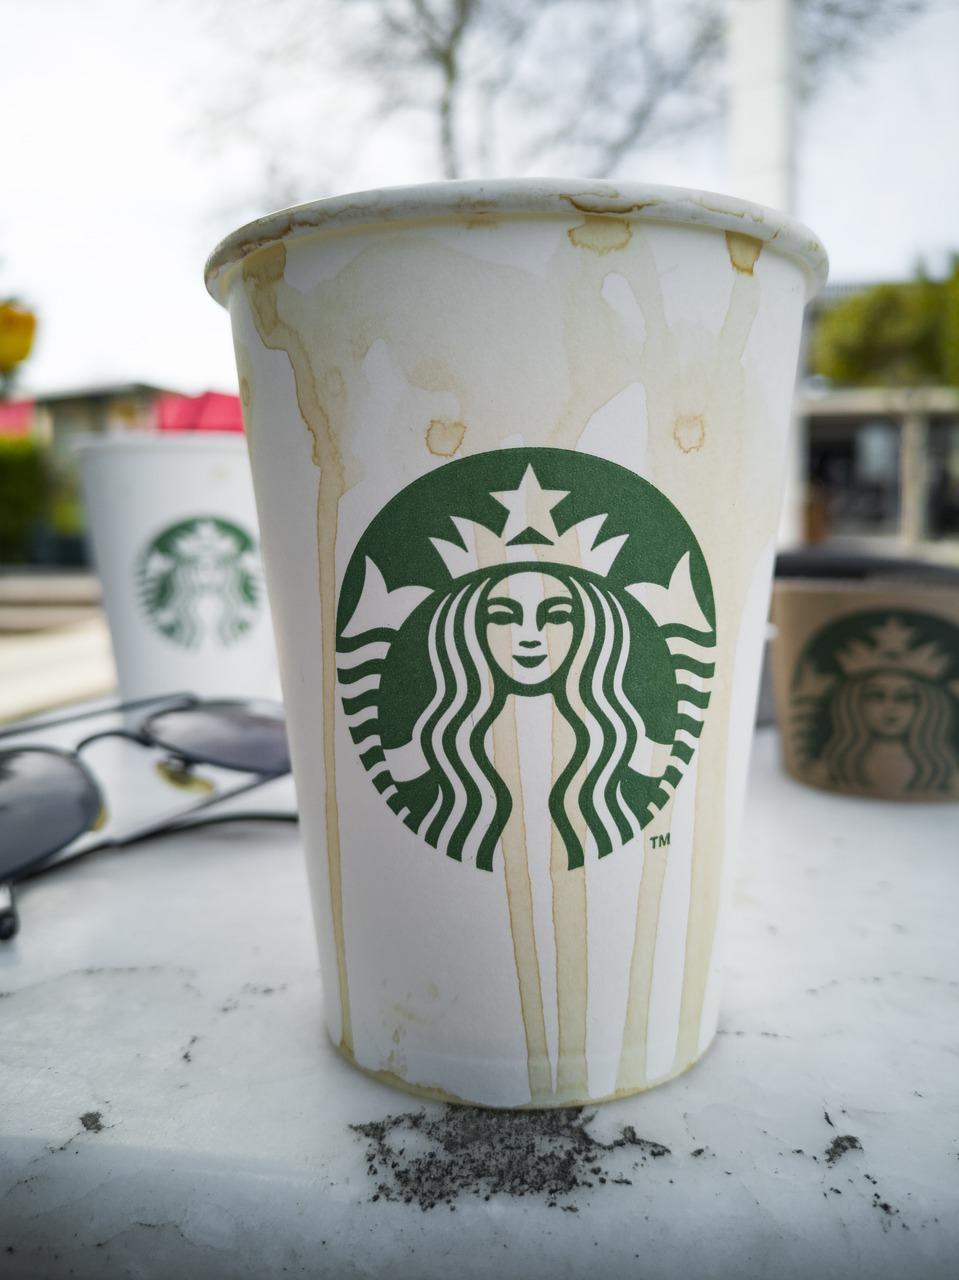 Starbucks coffee bad for you